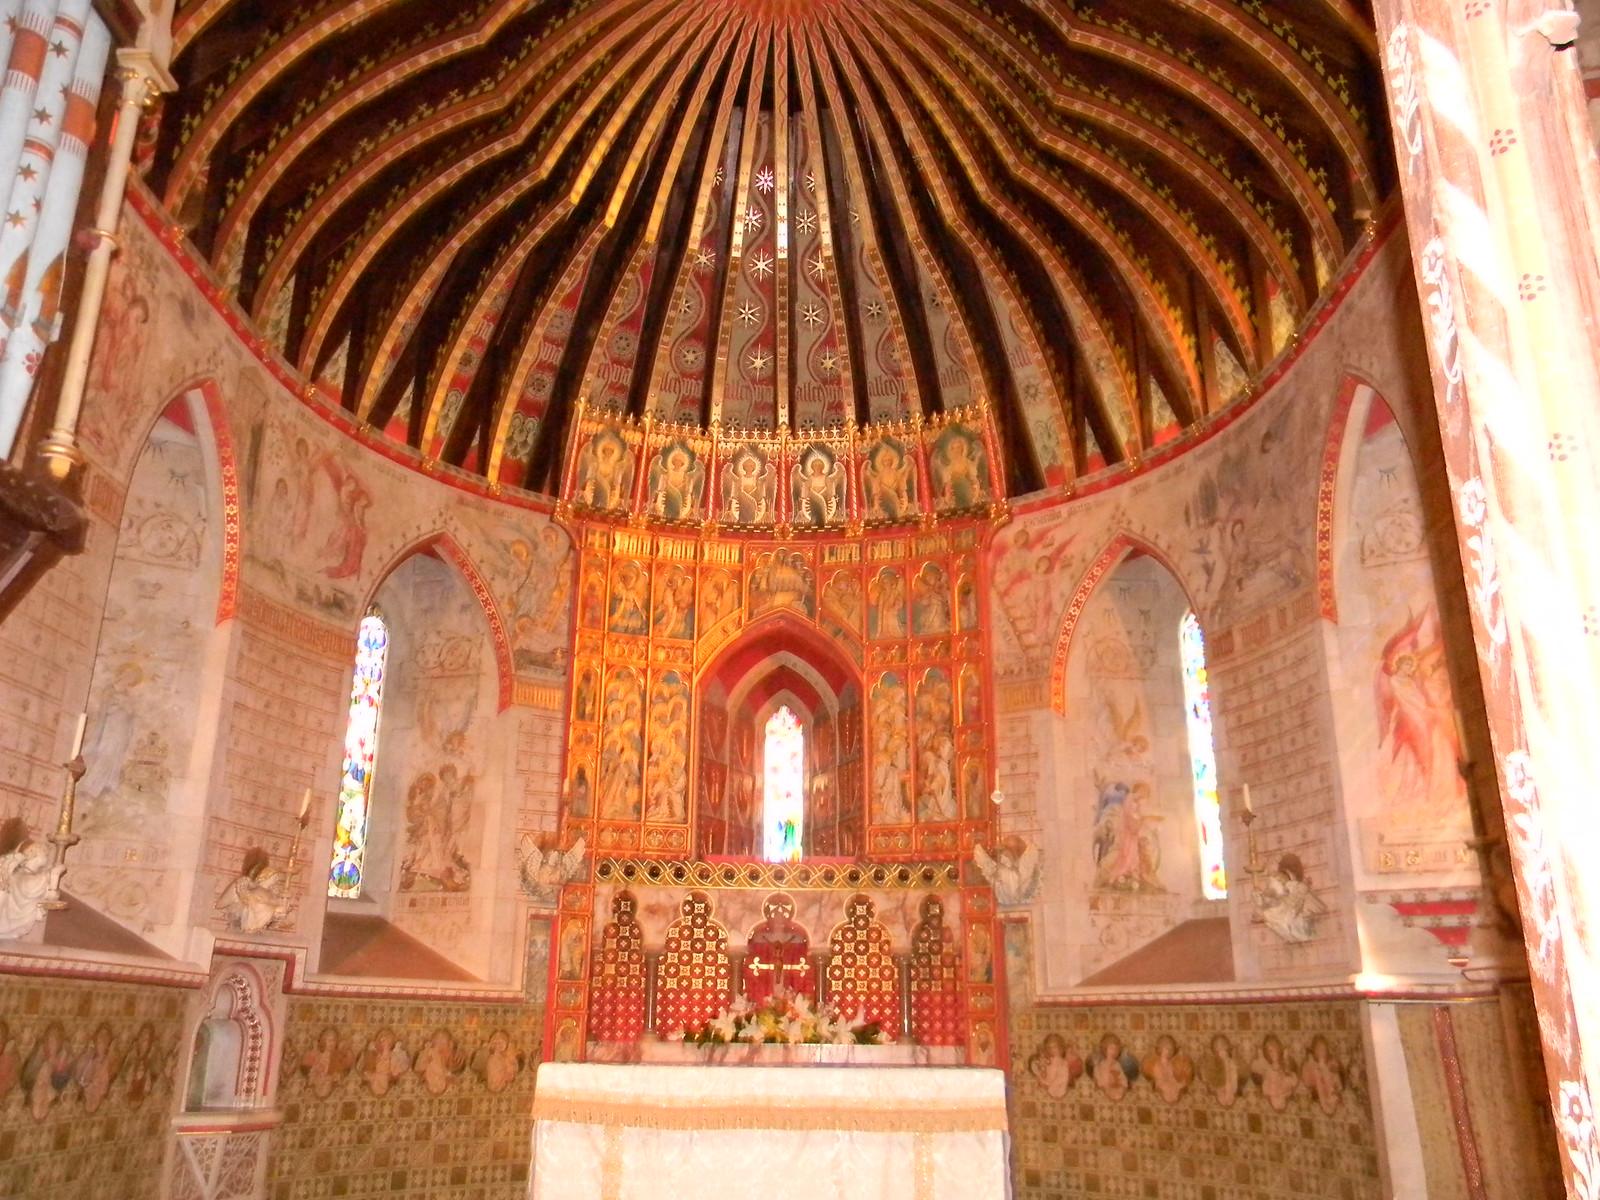 Inside Hascombe Church Milford to Godalming